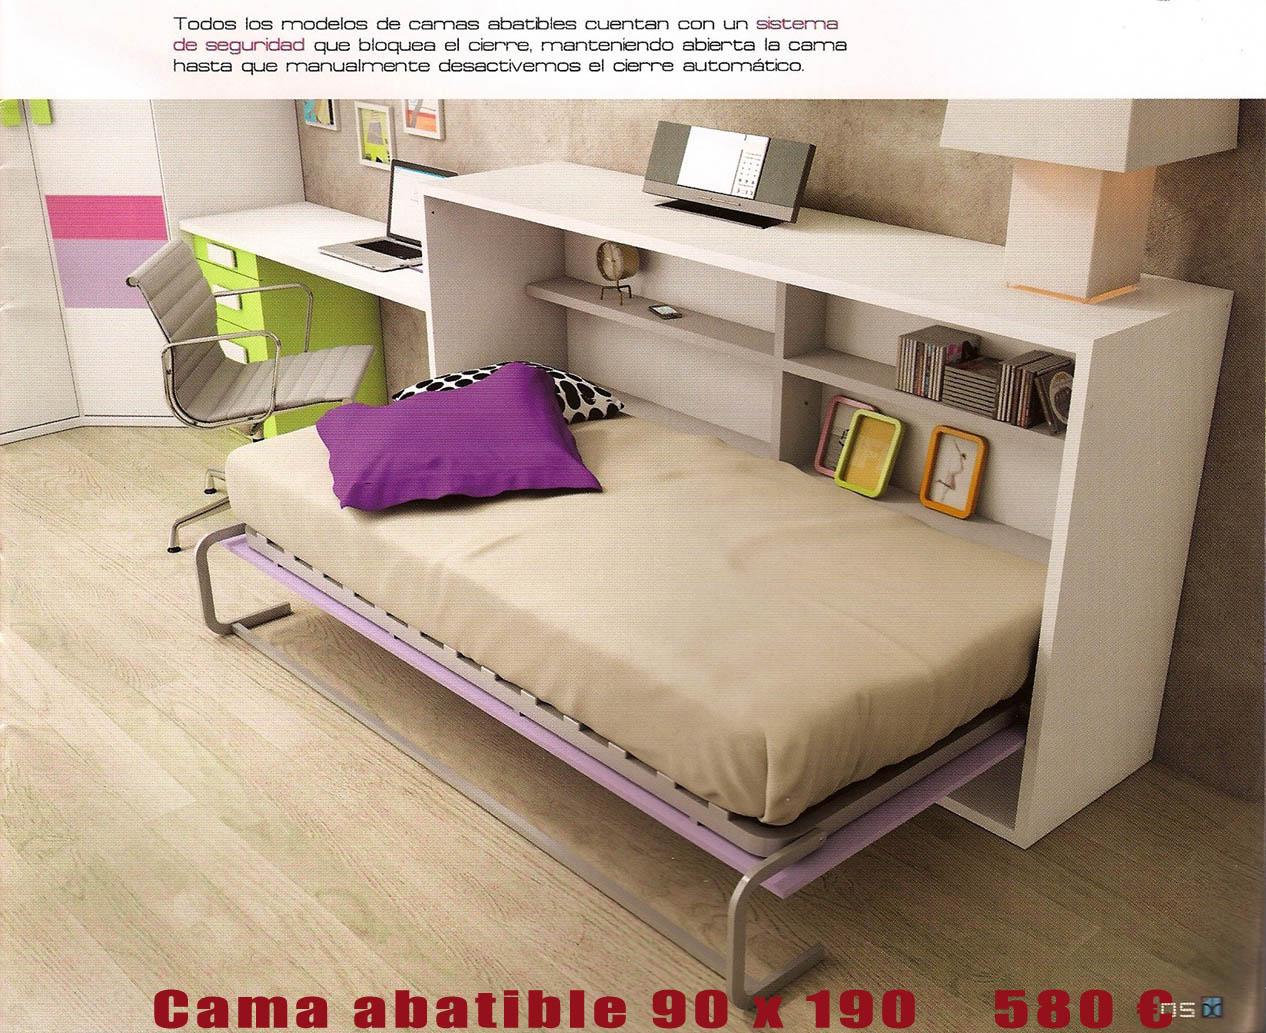 camas plegables baratas barcelona